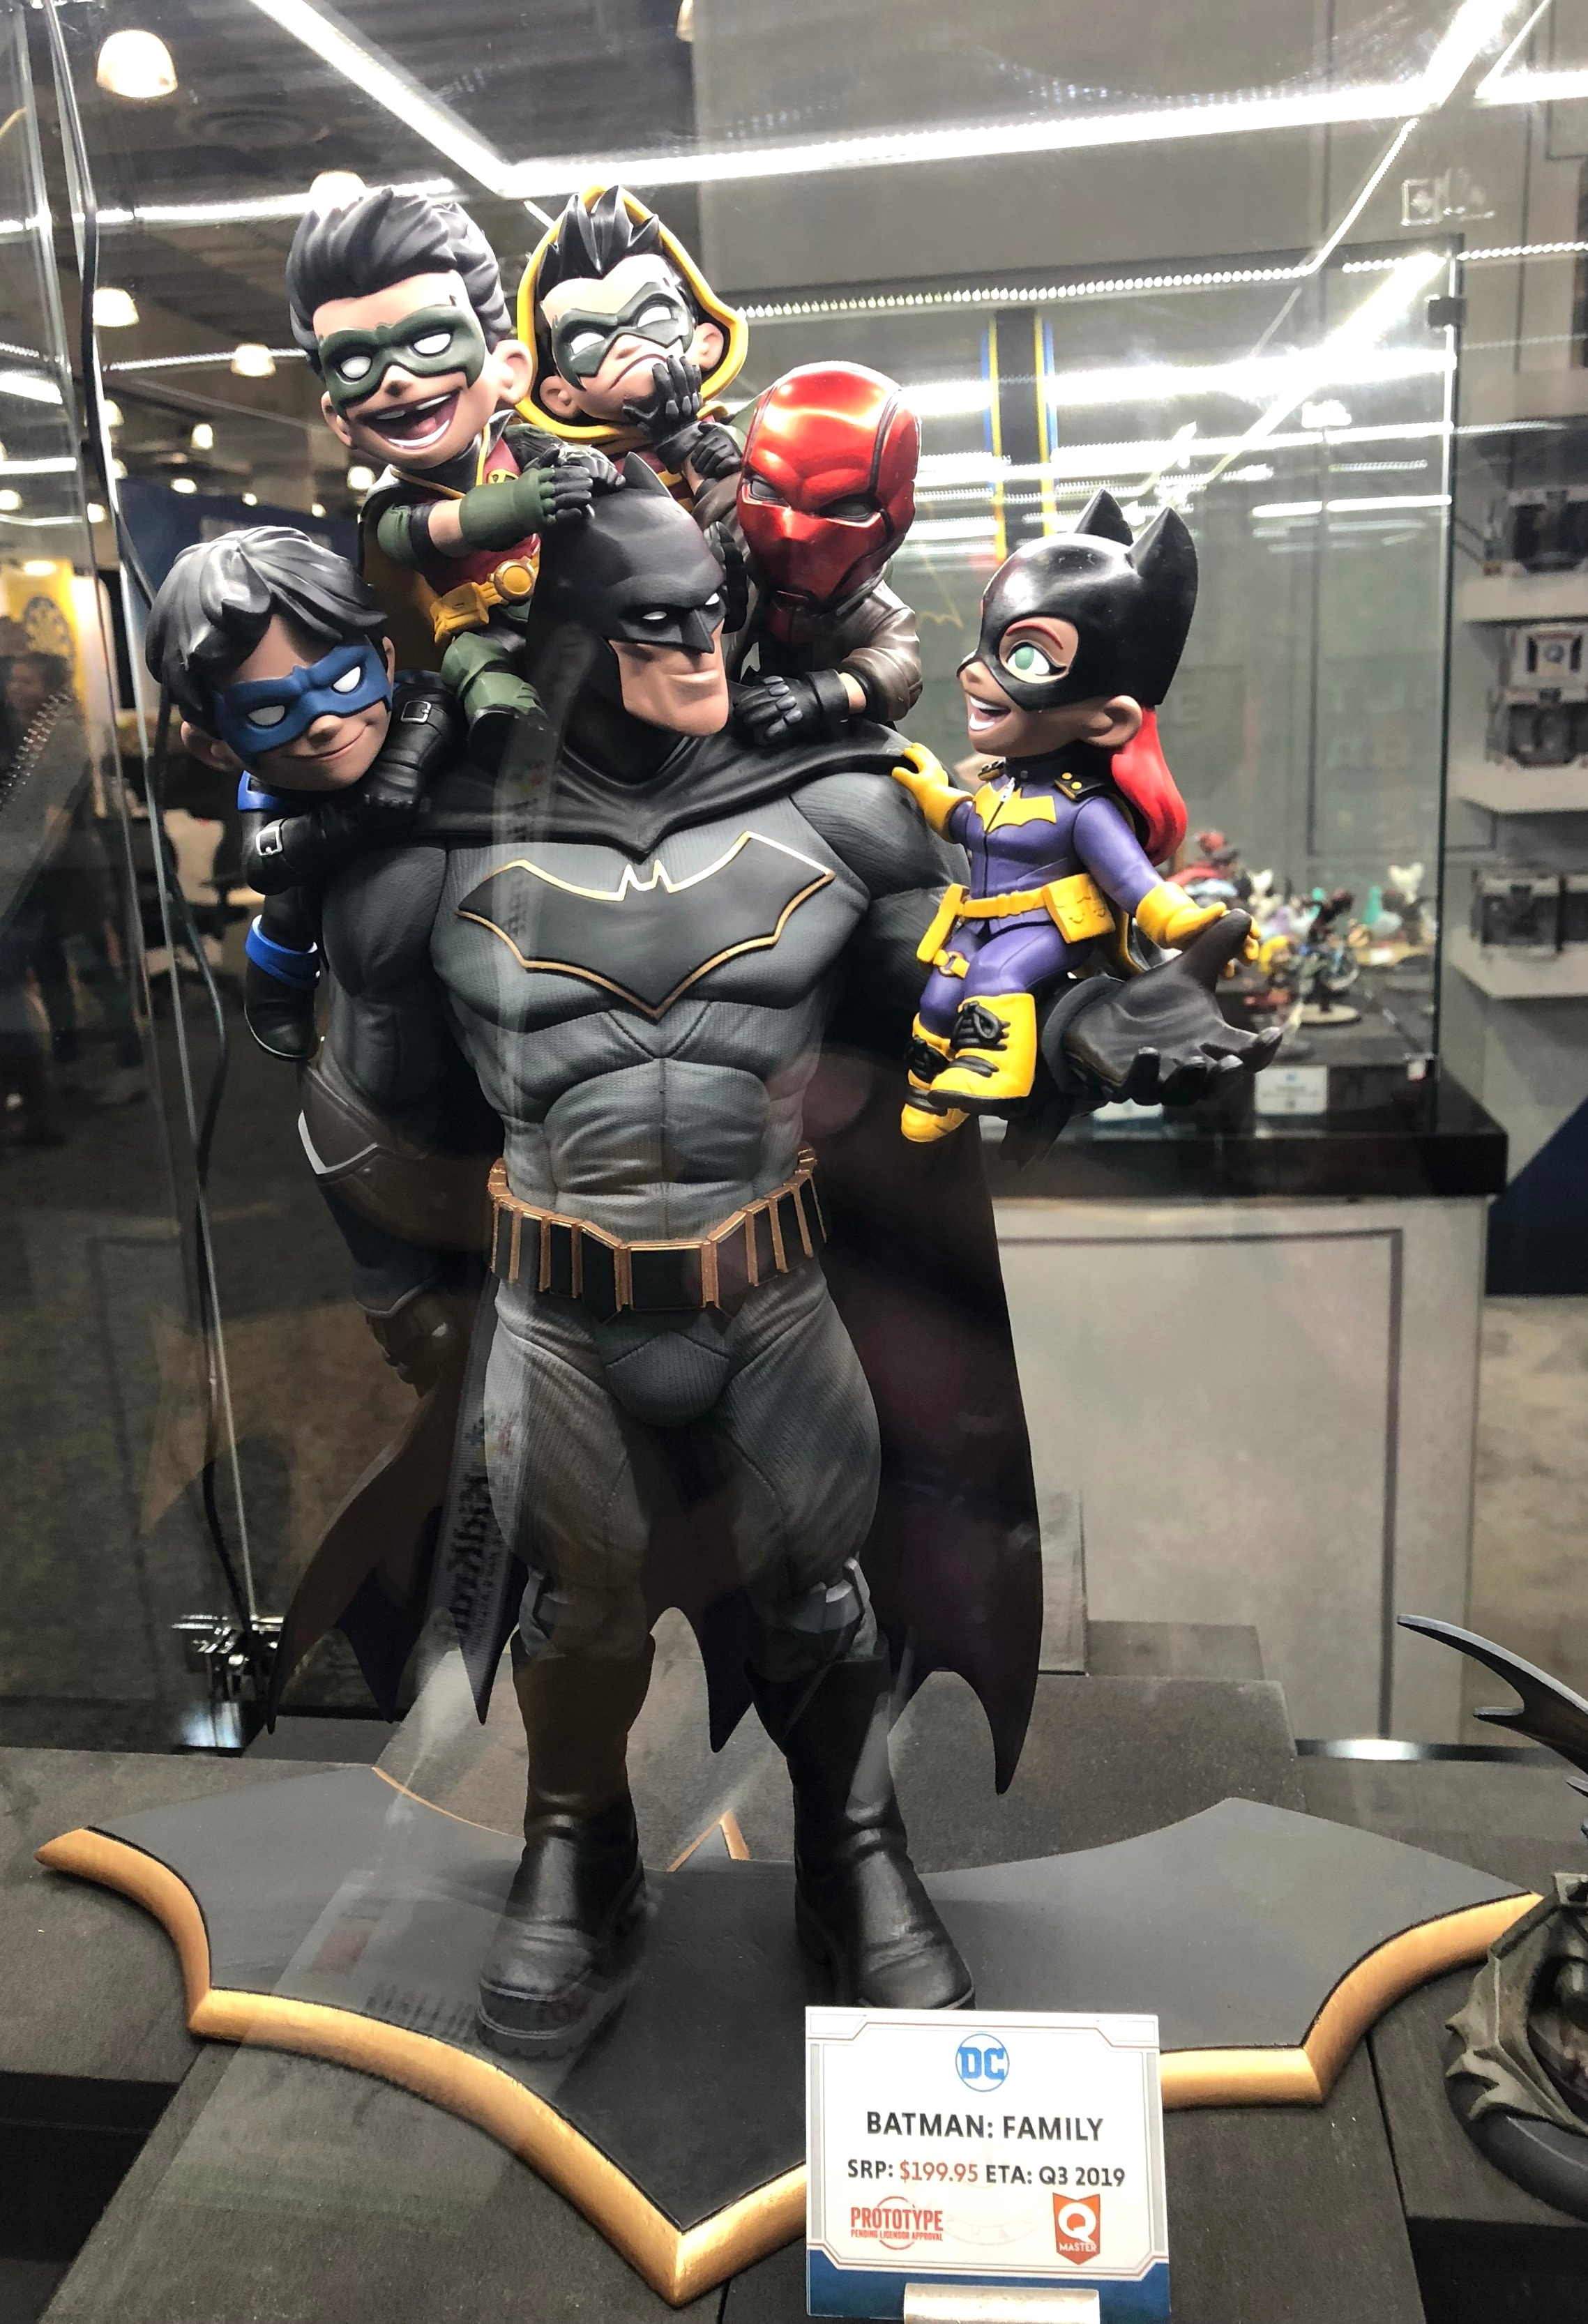 Batman family.jpg